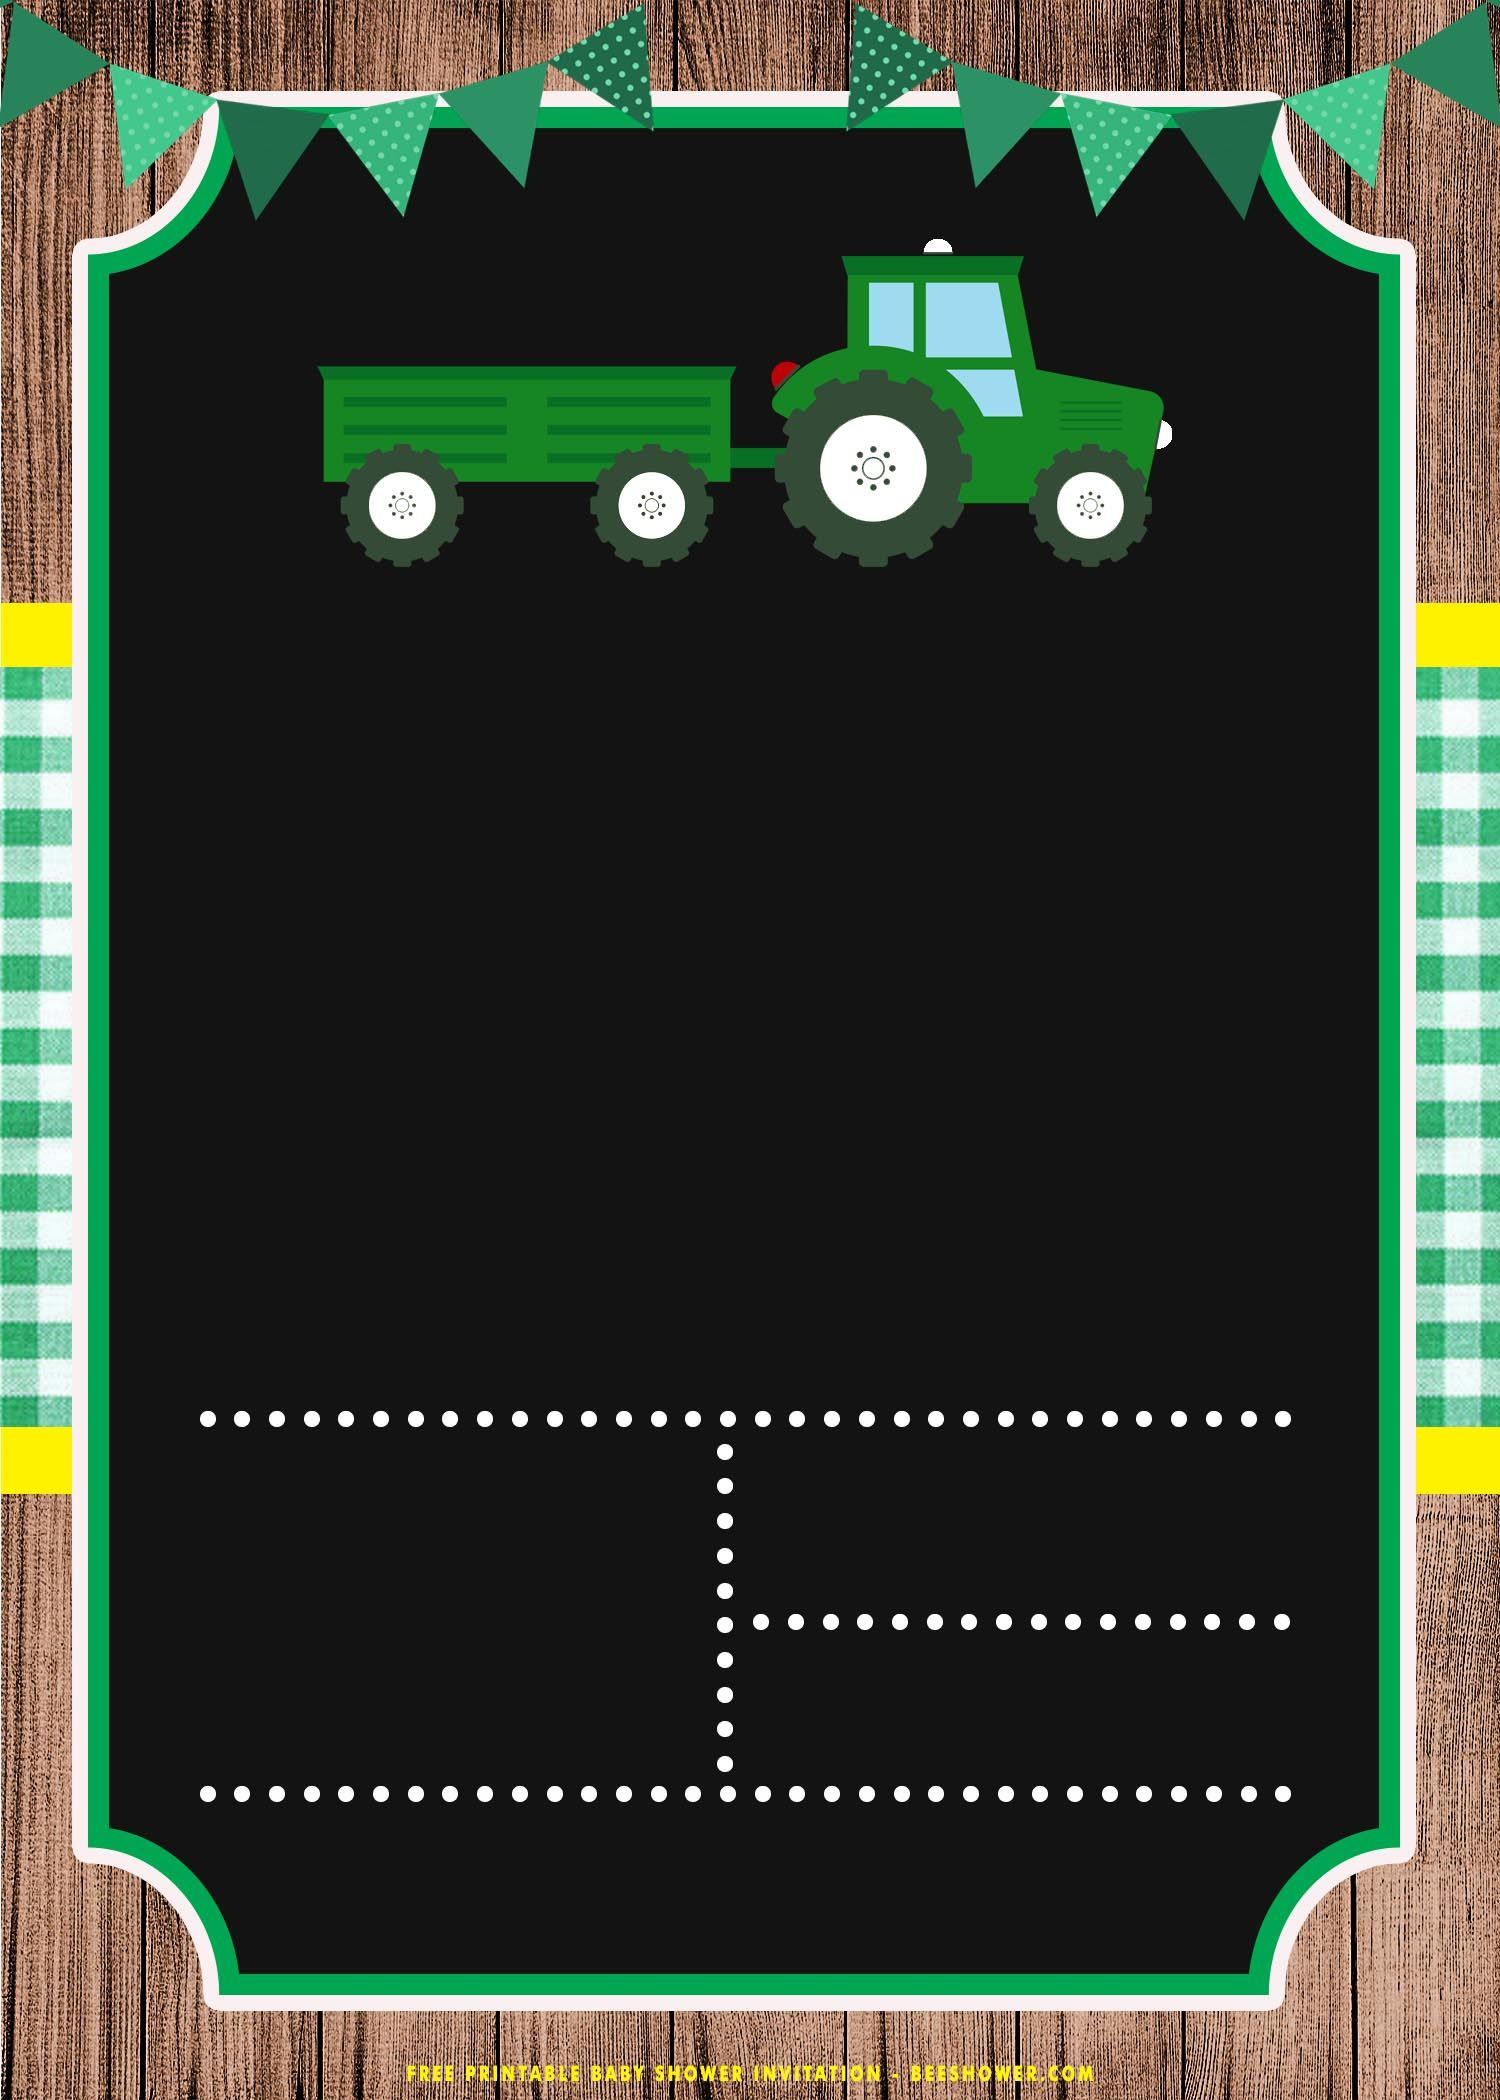 Free Printable Cute Tractor Birthday Invitation Templates Tractor Birthday Invitations Tractor Birthday Tractor Birthday Party